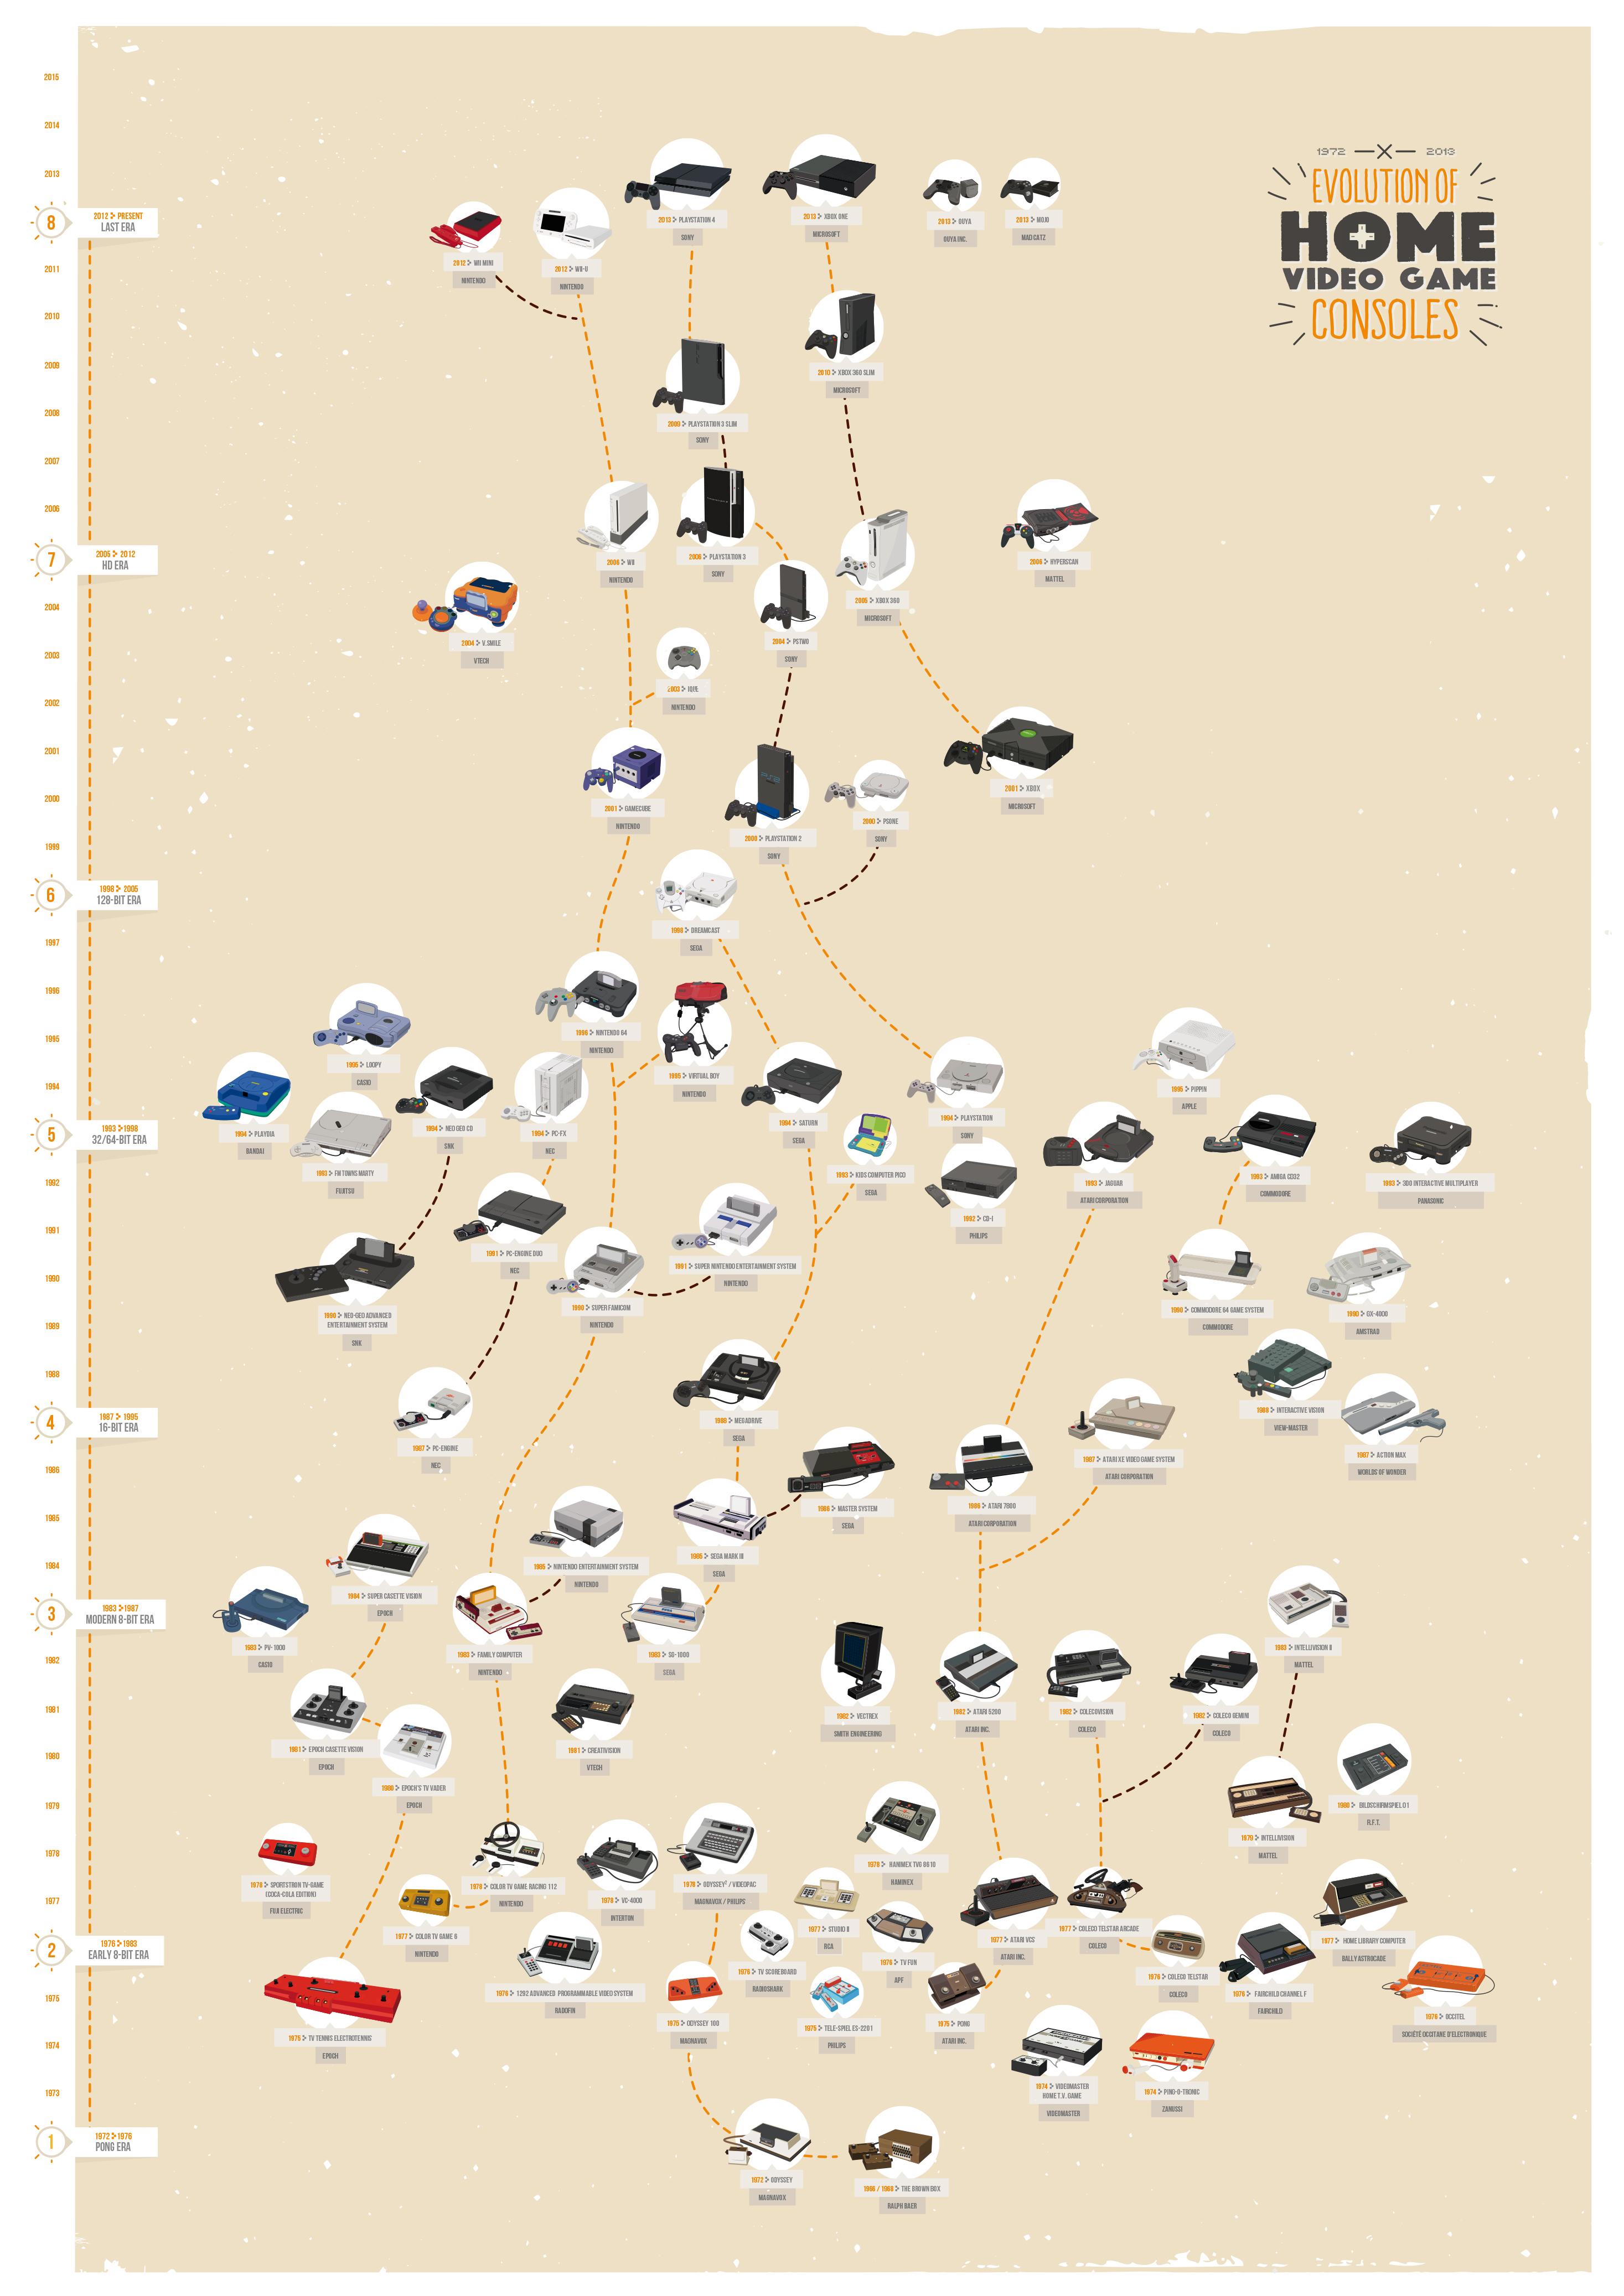 videogames_evolution_poster.jpg